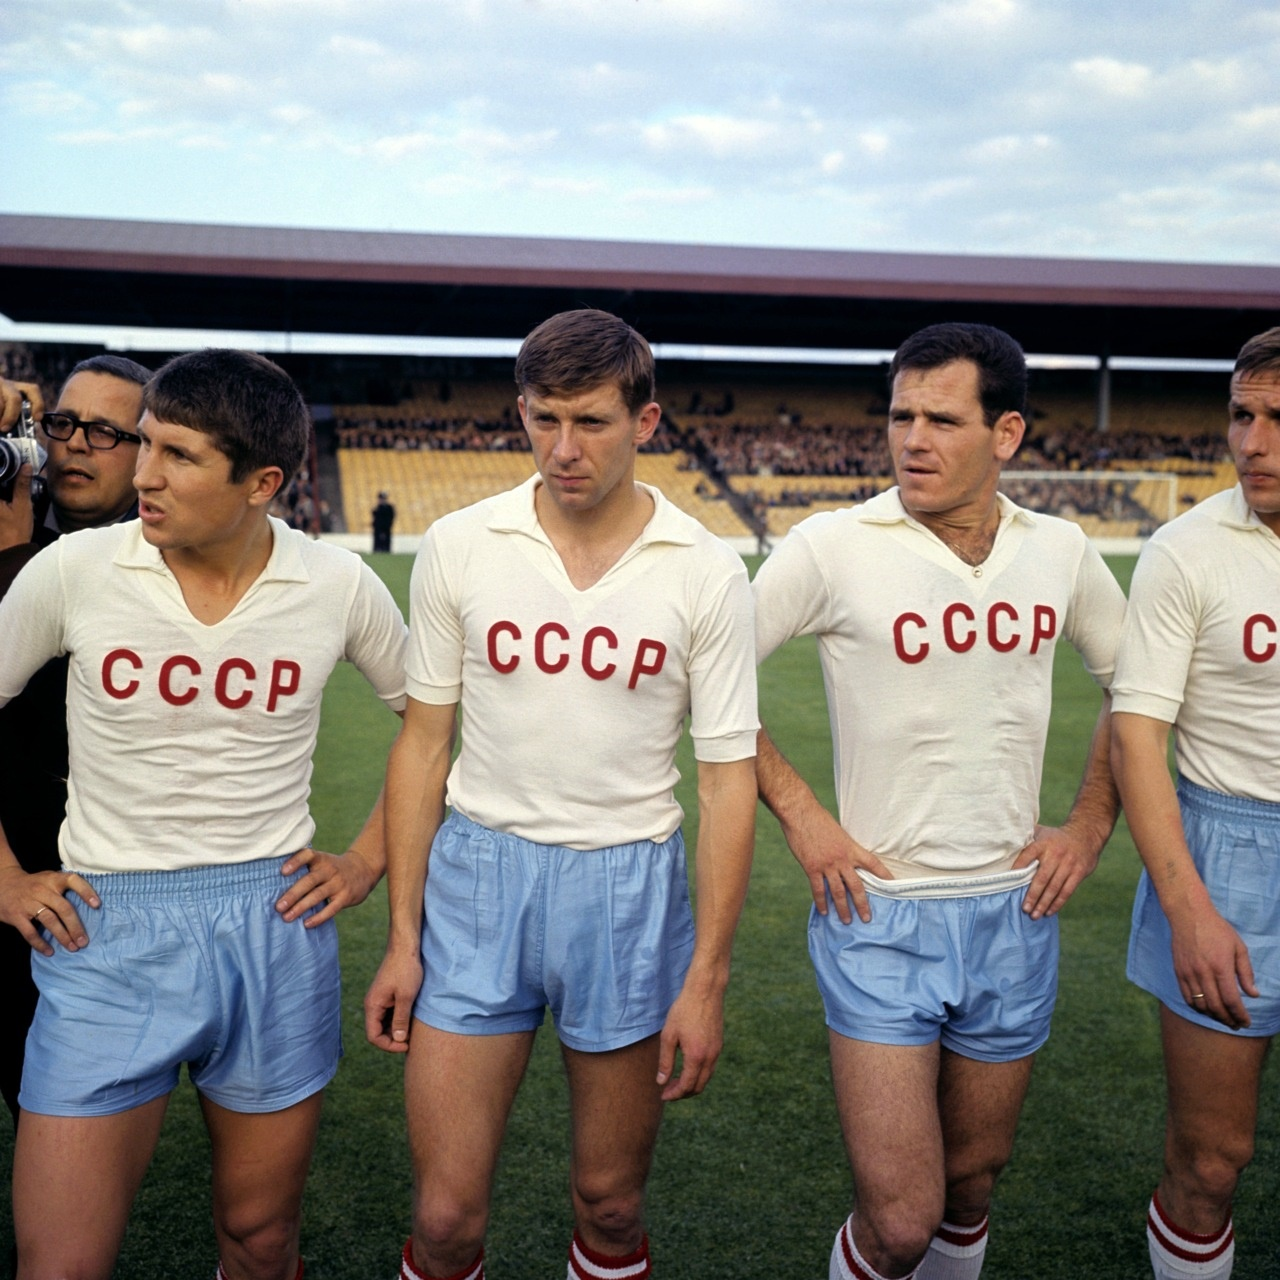 wchd-1966-urss-korea-Eduard Malofeev, Vladimir Ponomarev, Yozhef Sabo and Leonid Ostrovskiy